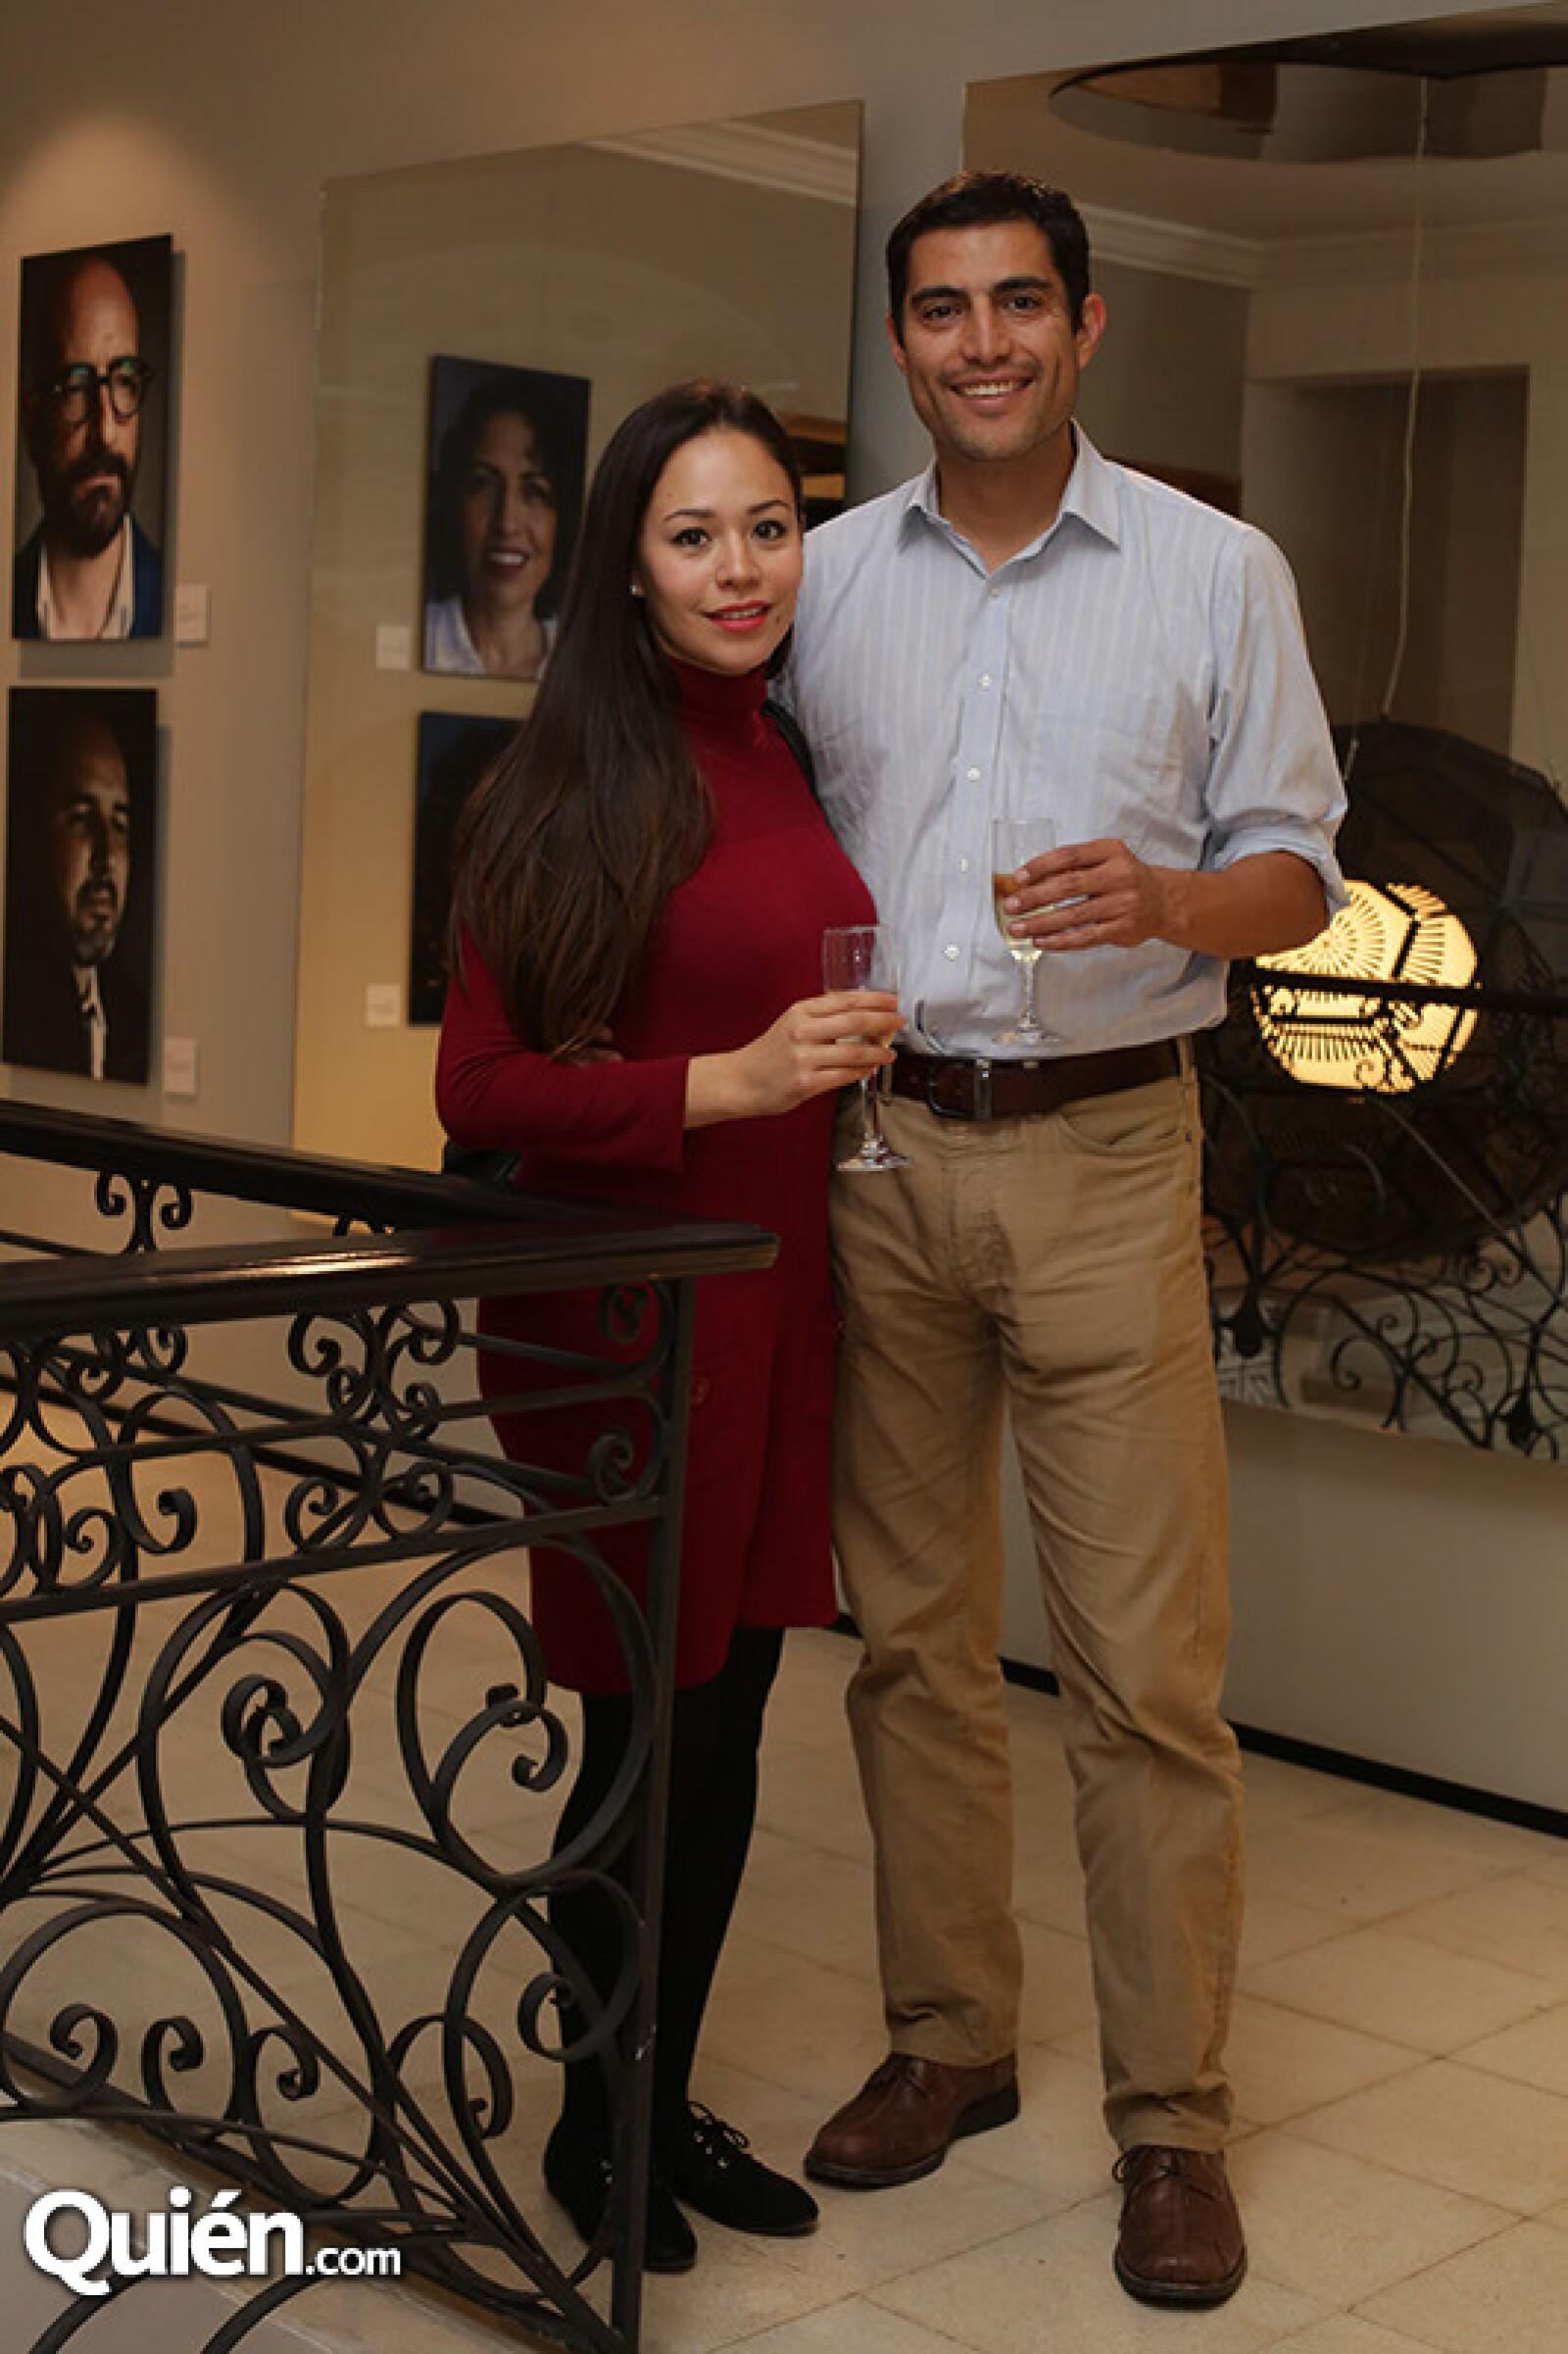 Natalia Guzmán y Luis Ramírez